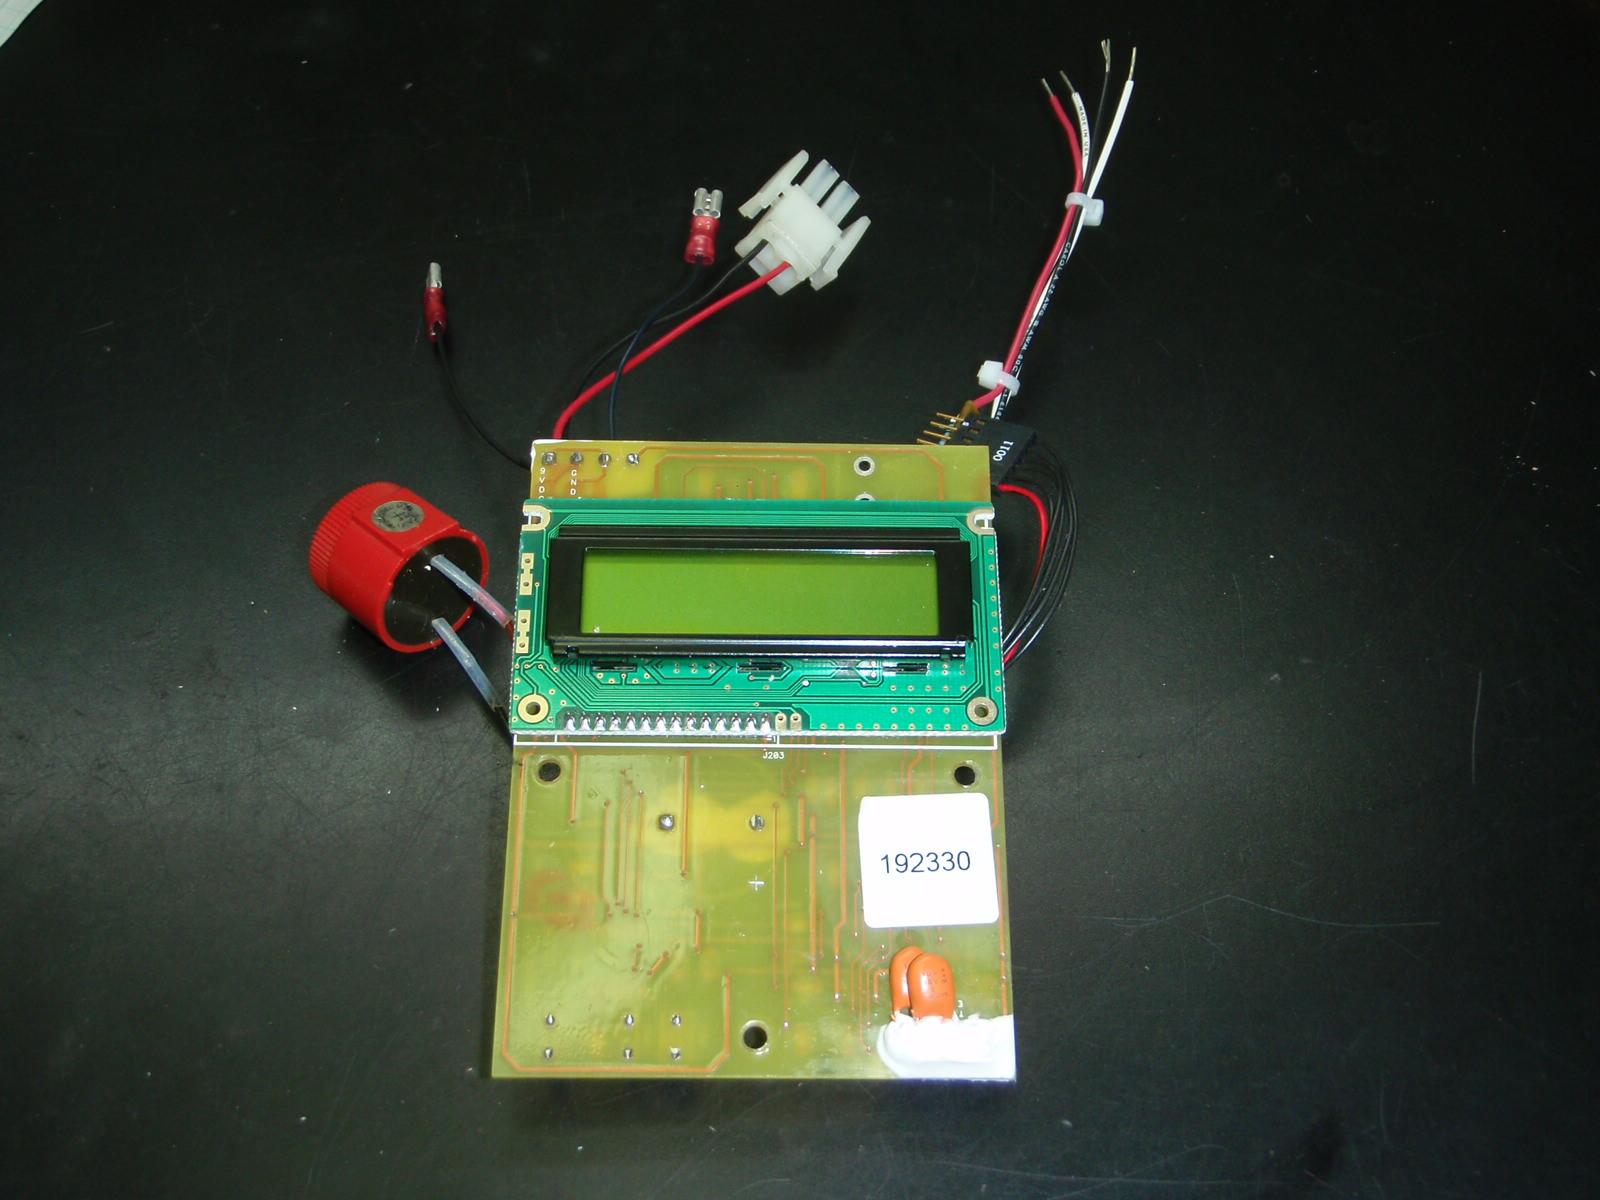 Viper GT circuit board, 981580